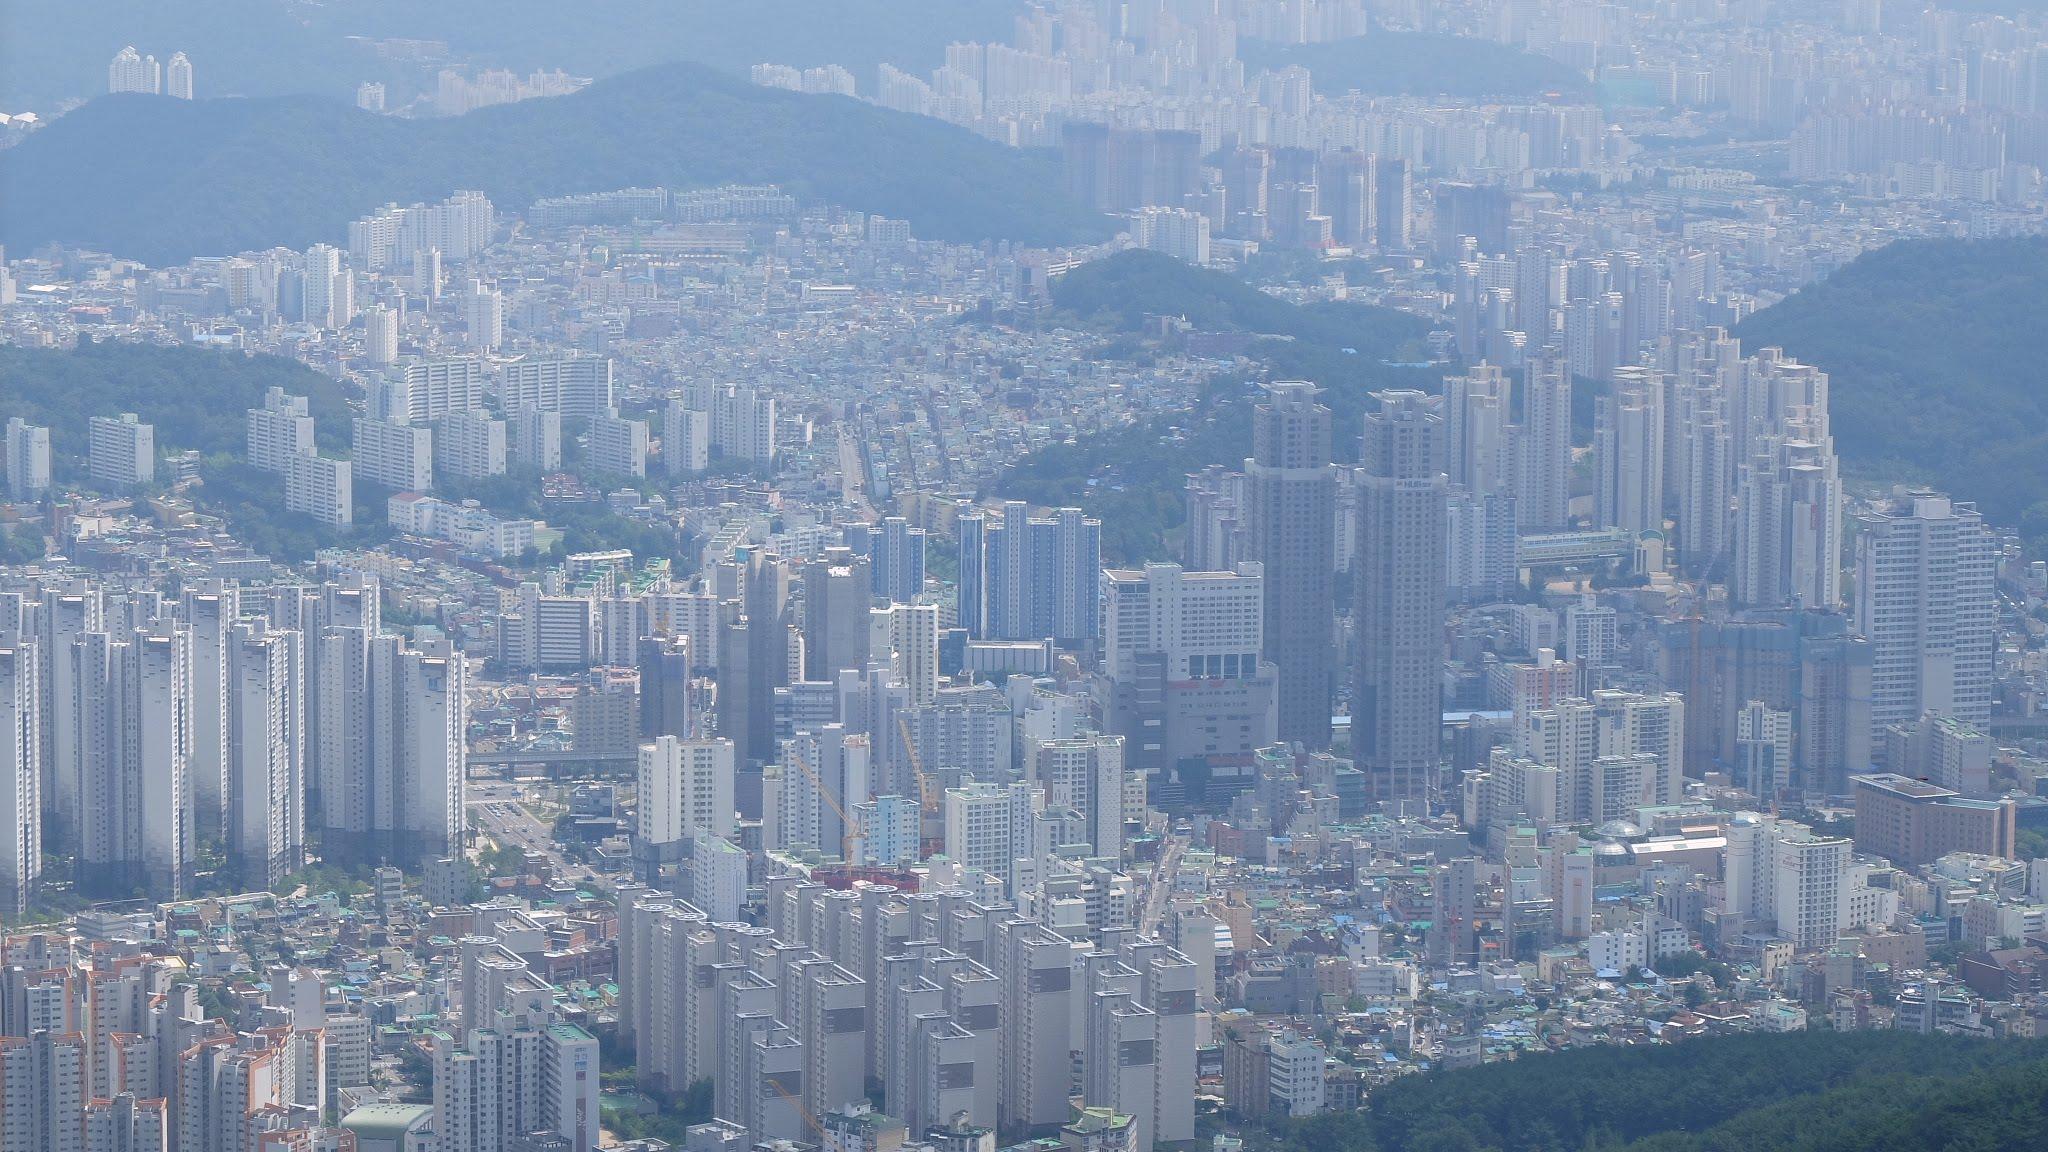 Vista de Busan